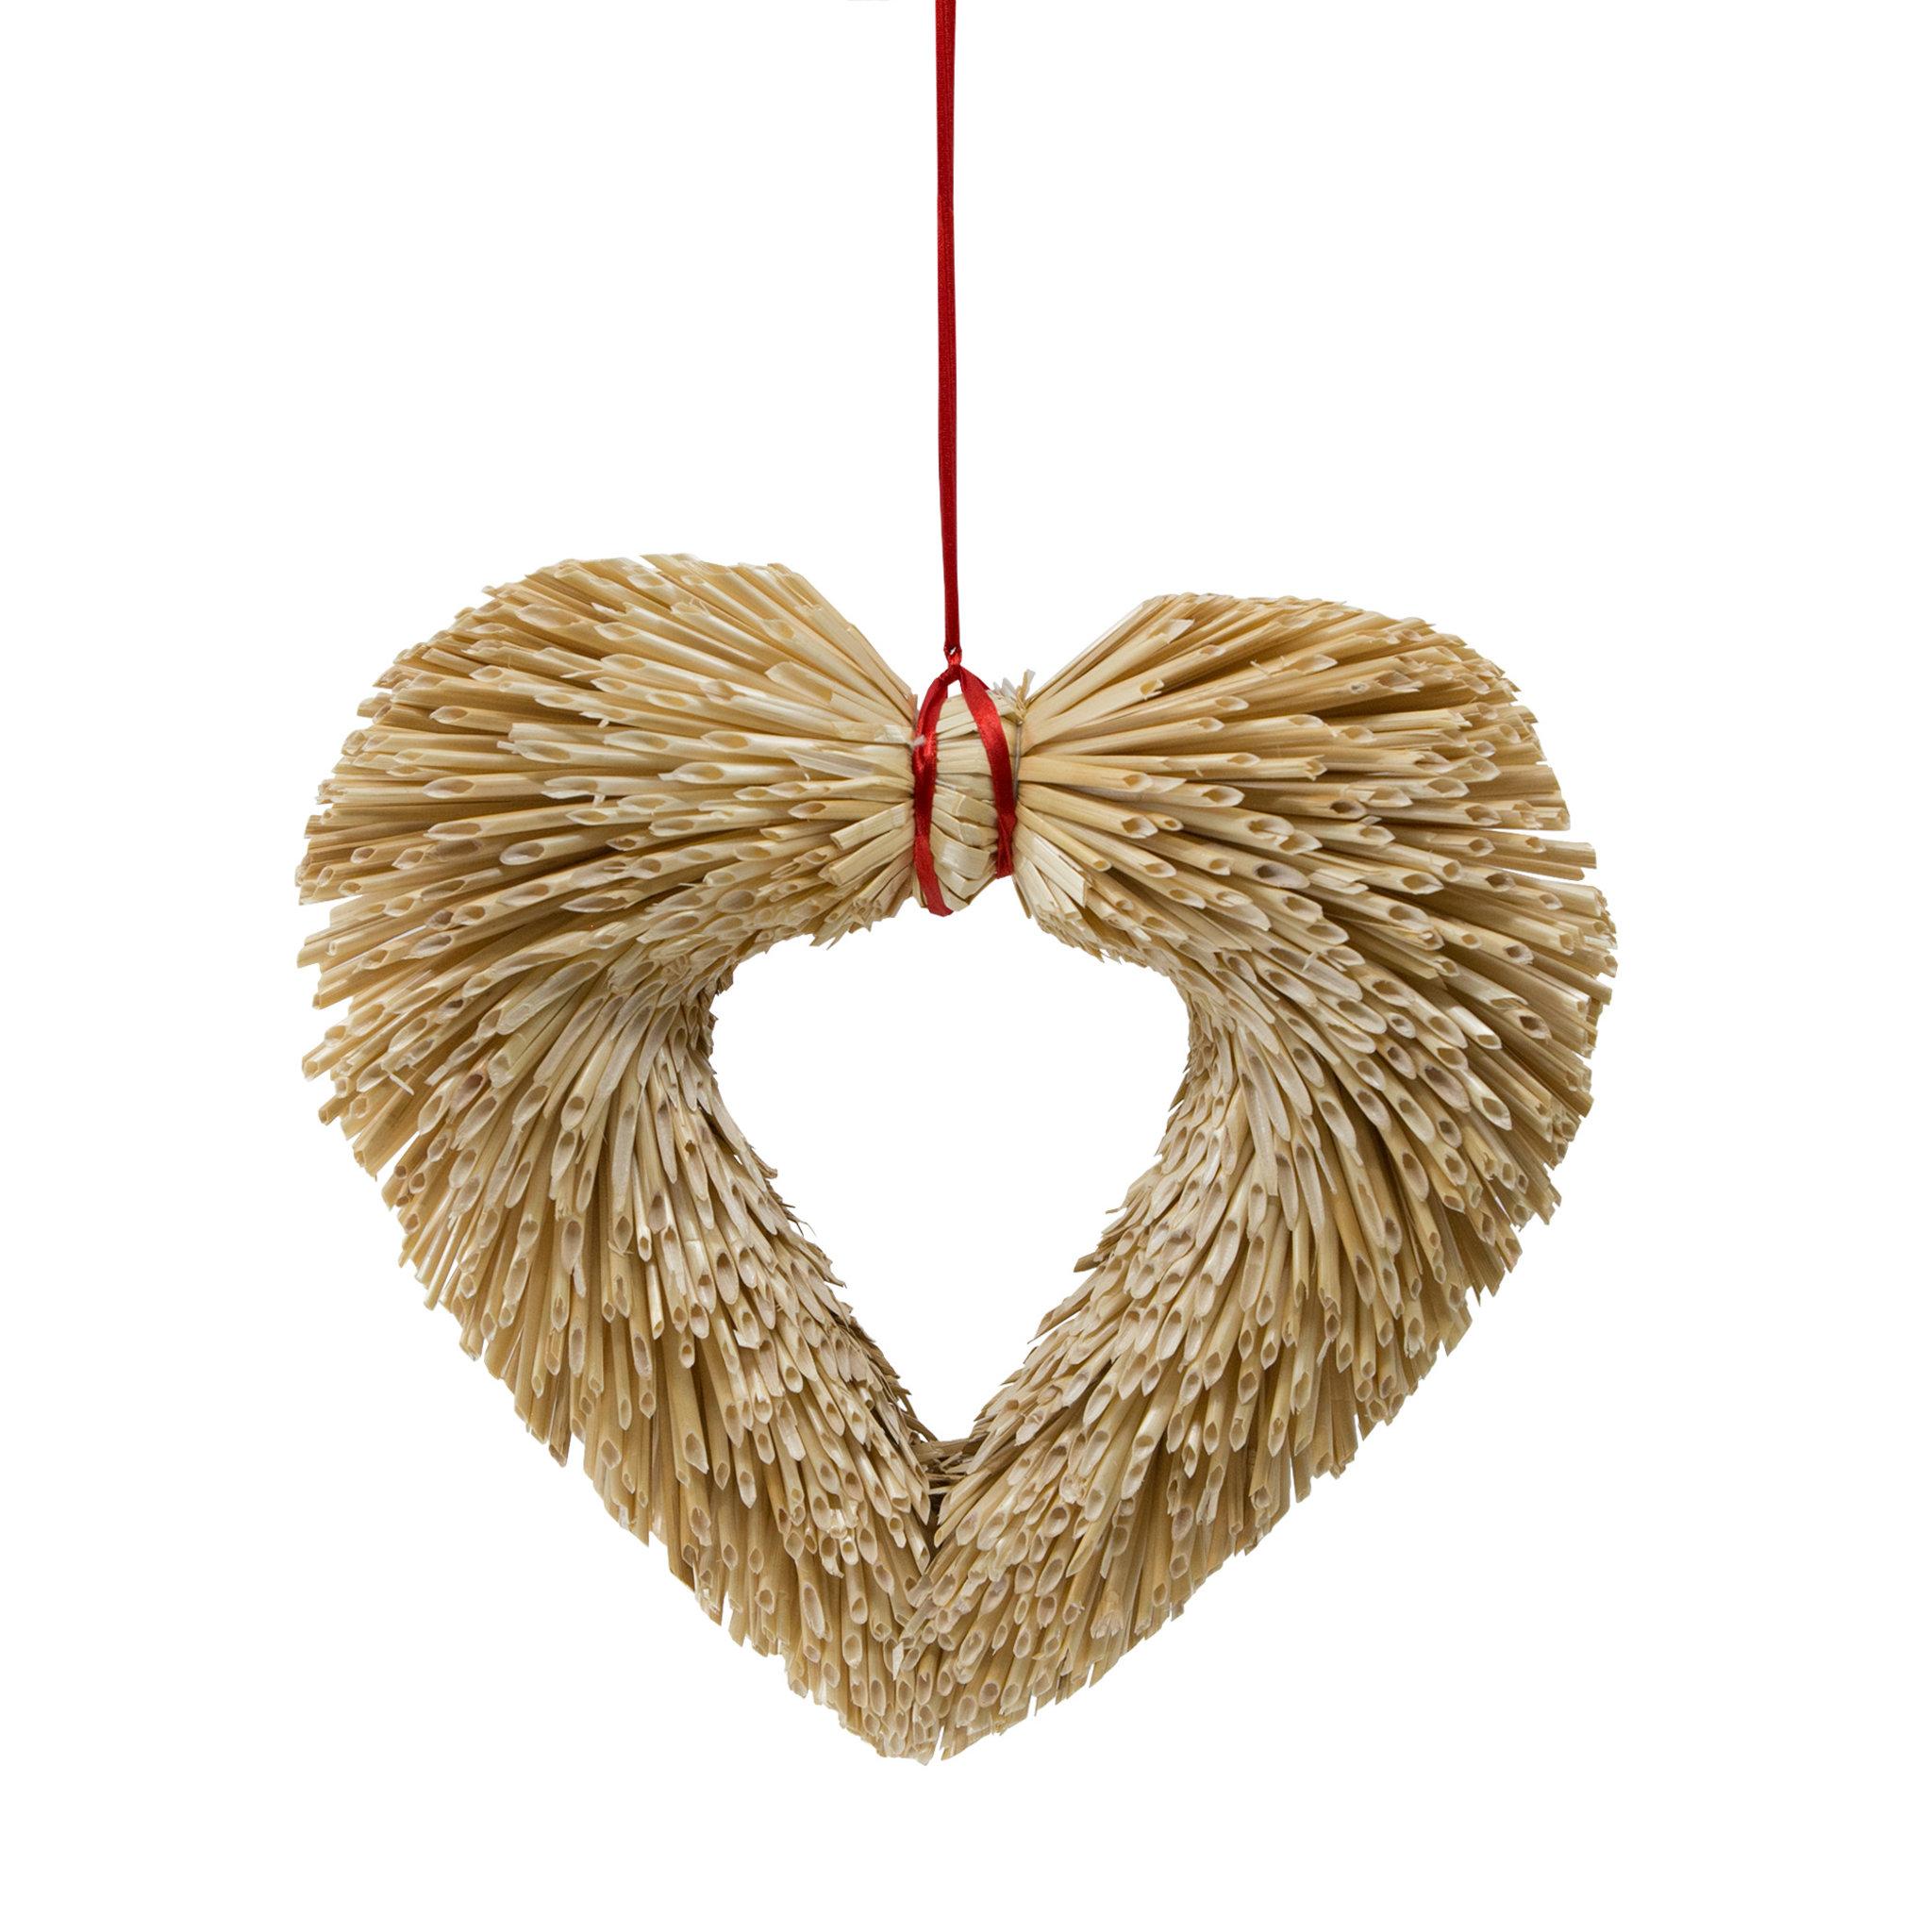 Dörrkrans Hjärta i halm 30 cm